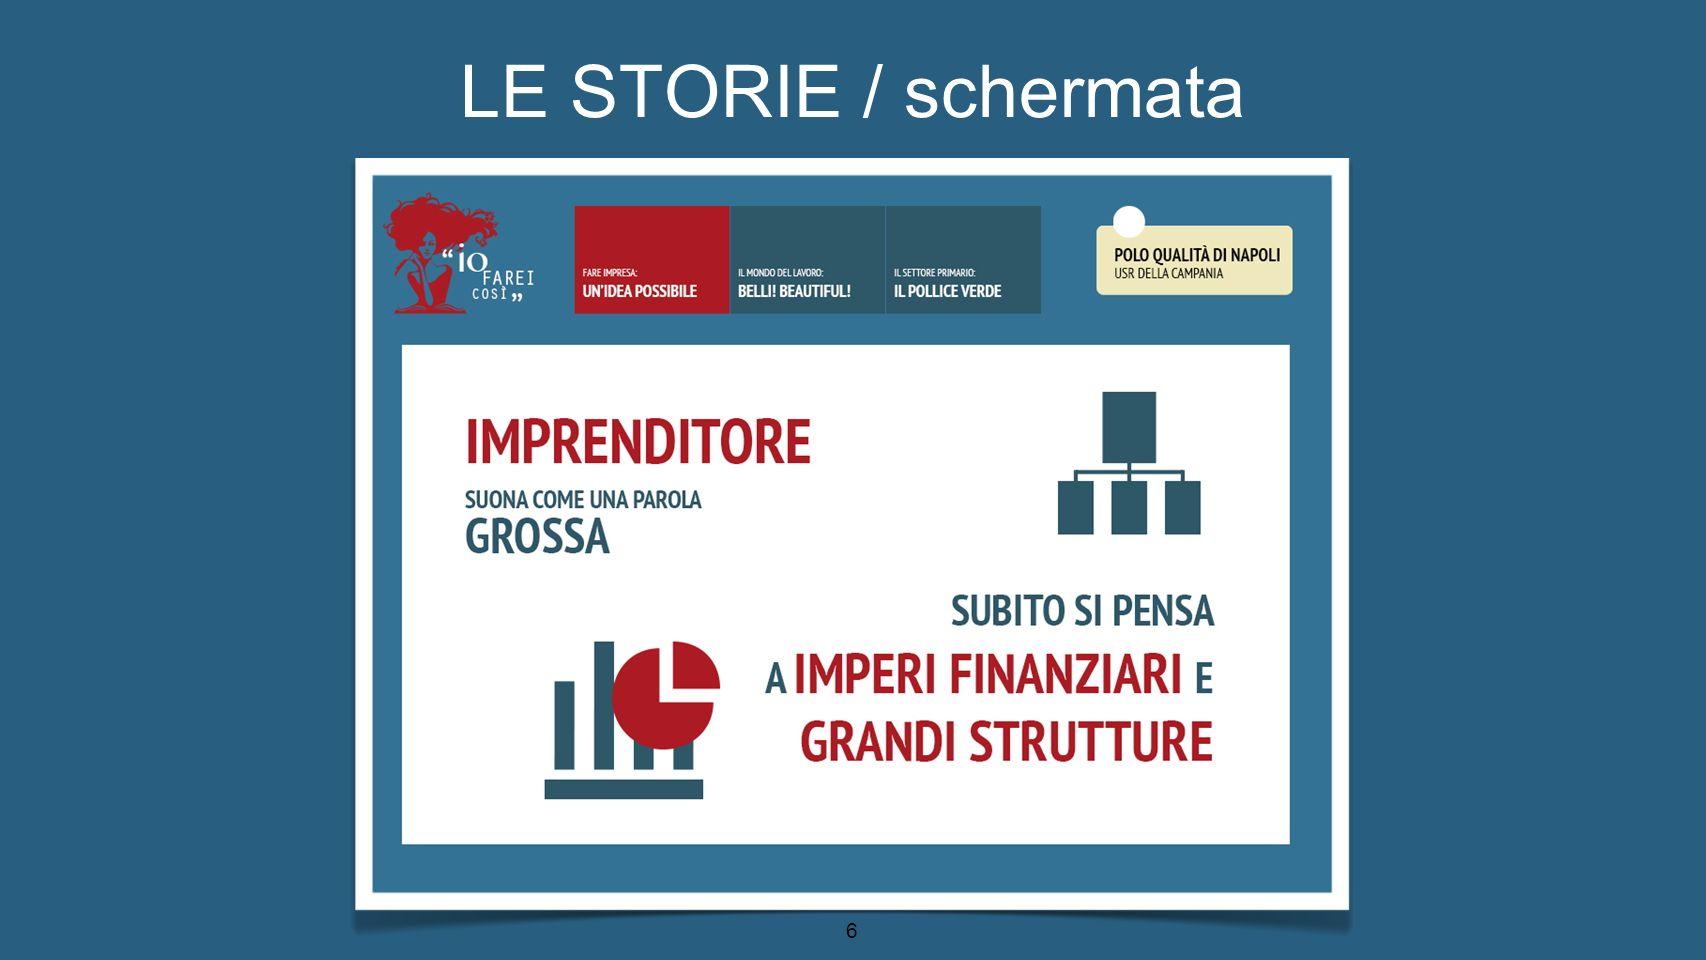 LE STORIE / schermata